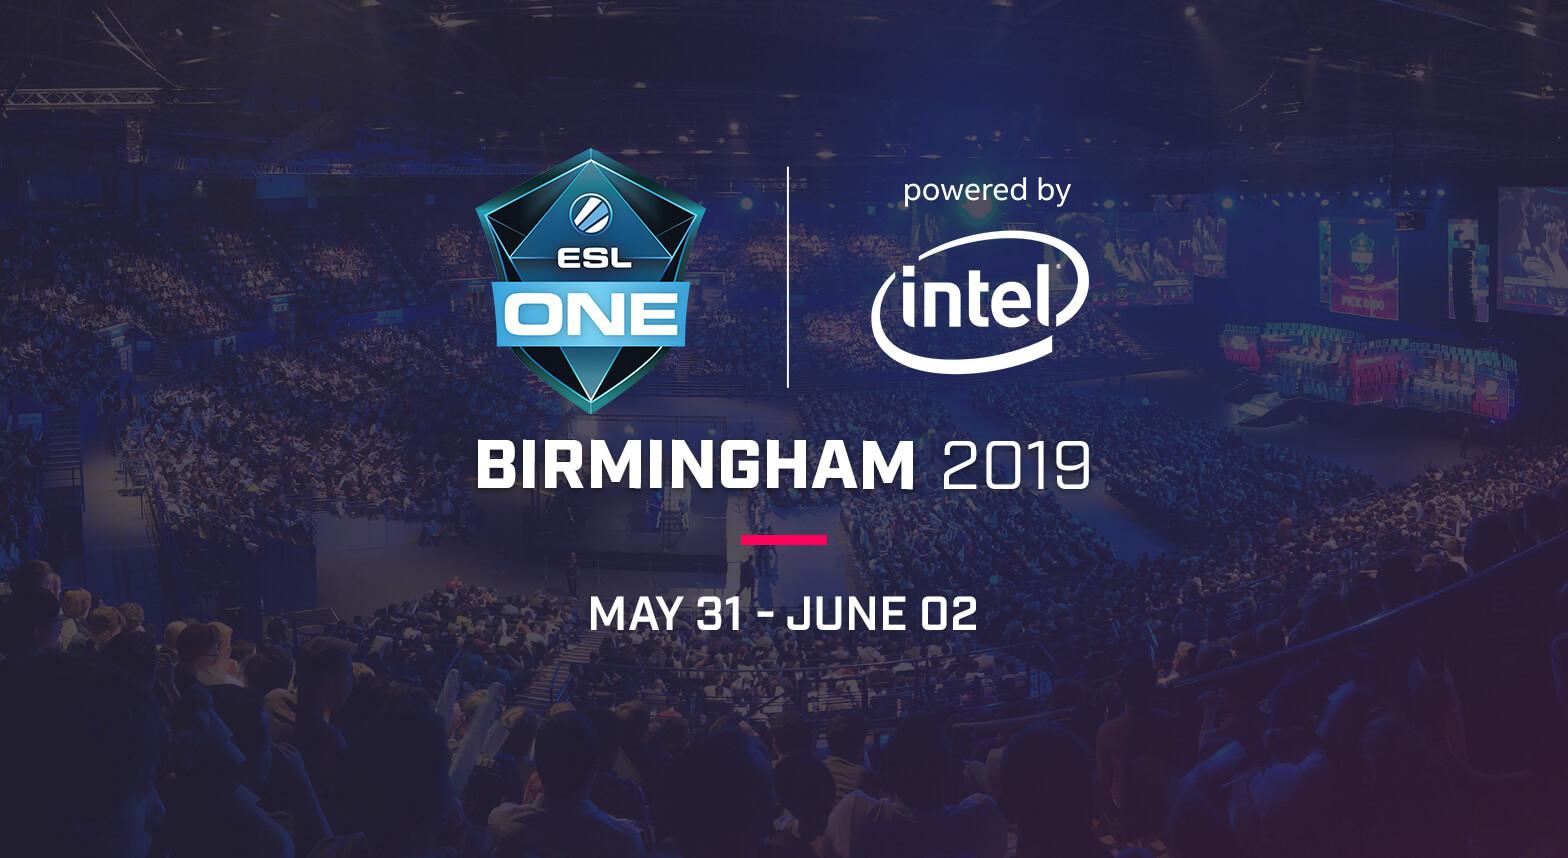 esl-one-2019-arenas.jpg